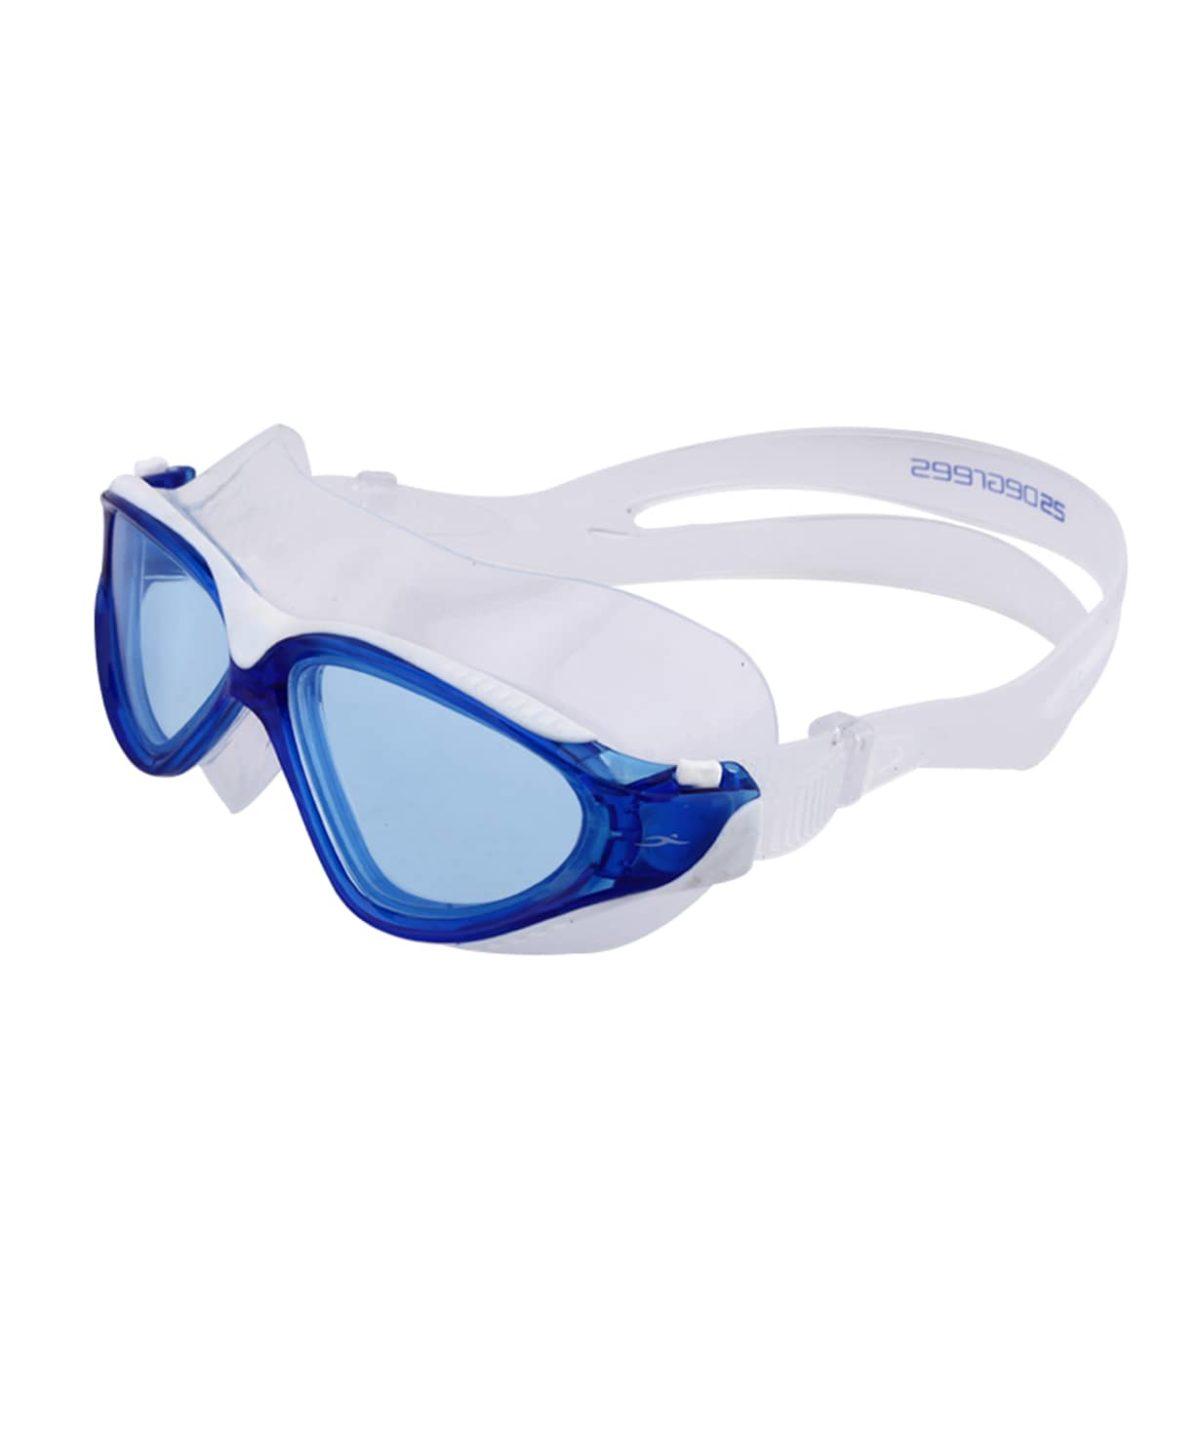 25DEGREES Маска для плавания Yogic Transparent  25D04-YG25-20-30 - 1